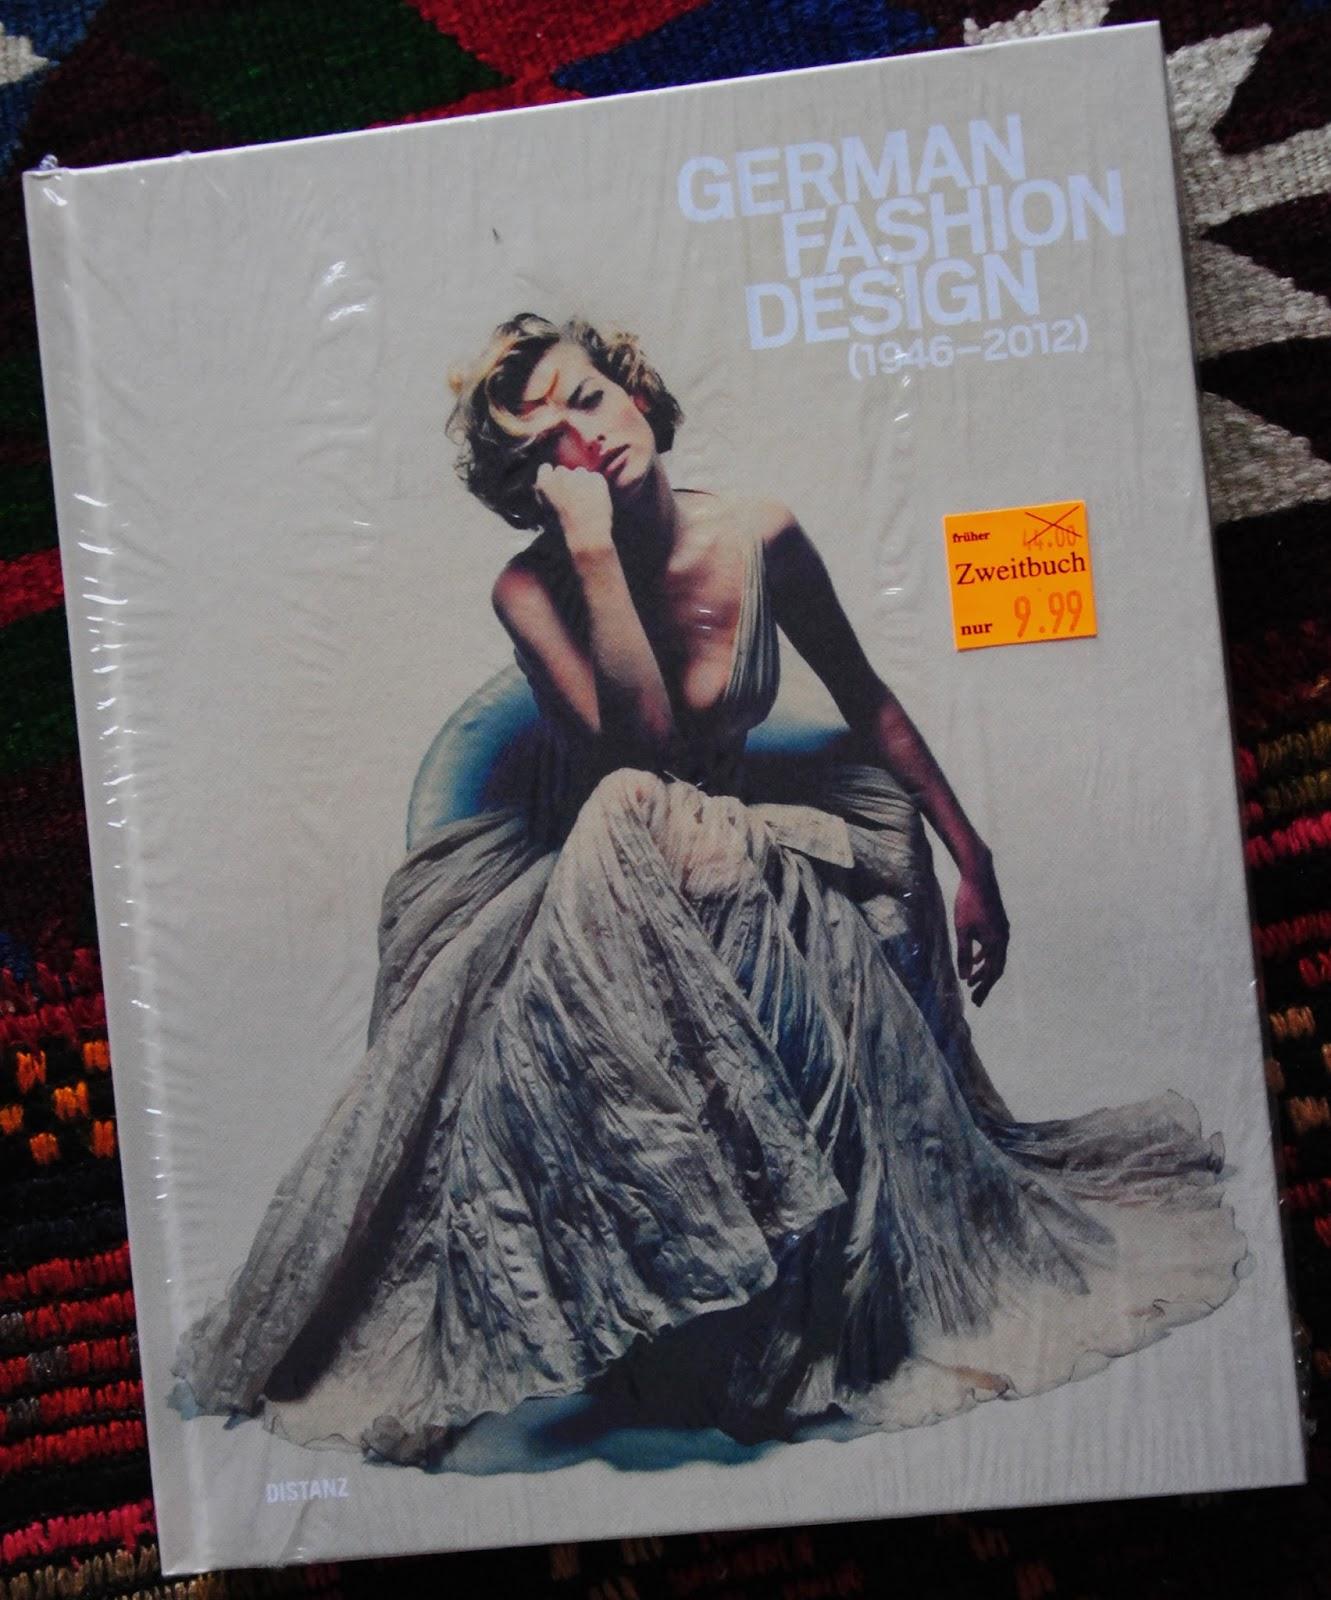 Royal Fashion Beauty Champagner 45131 Essen: RENE SCHALLER: German Fashion Design (1946-2012